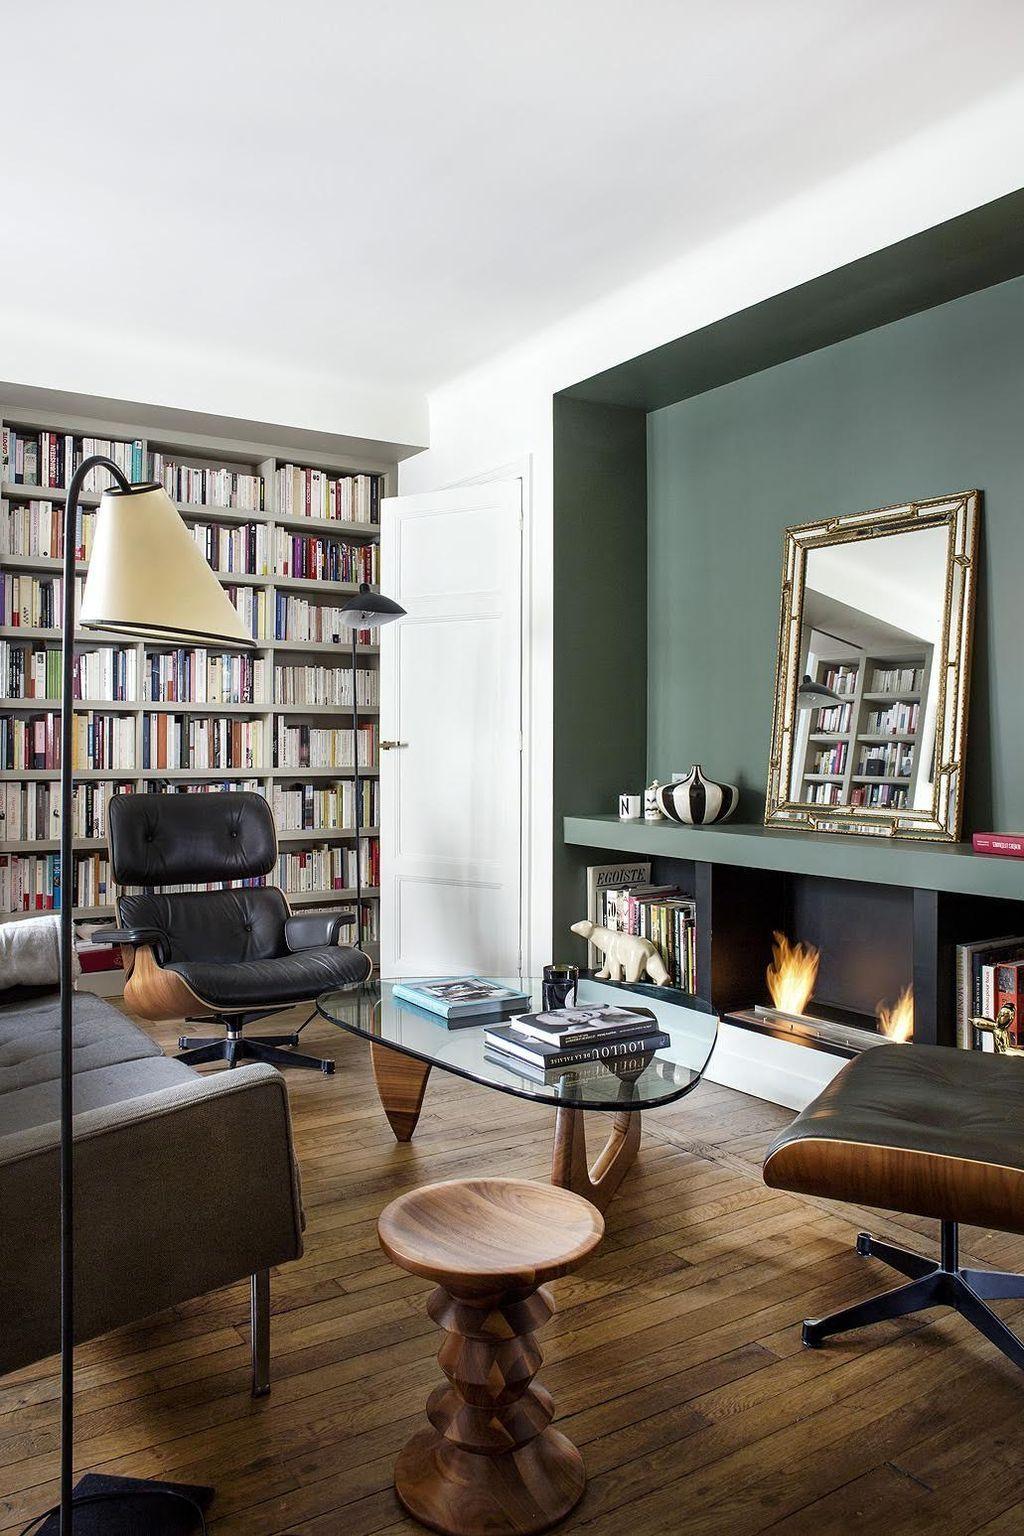 88 Creative Living Room Decoration Ideas For Small Apartment Entrancing Living Room Design Small Inspiration Design